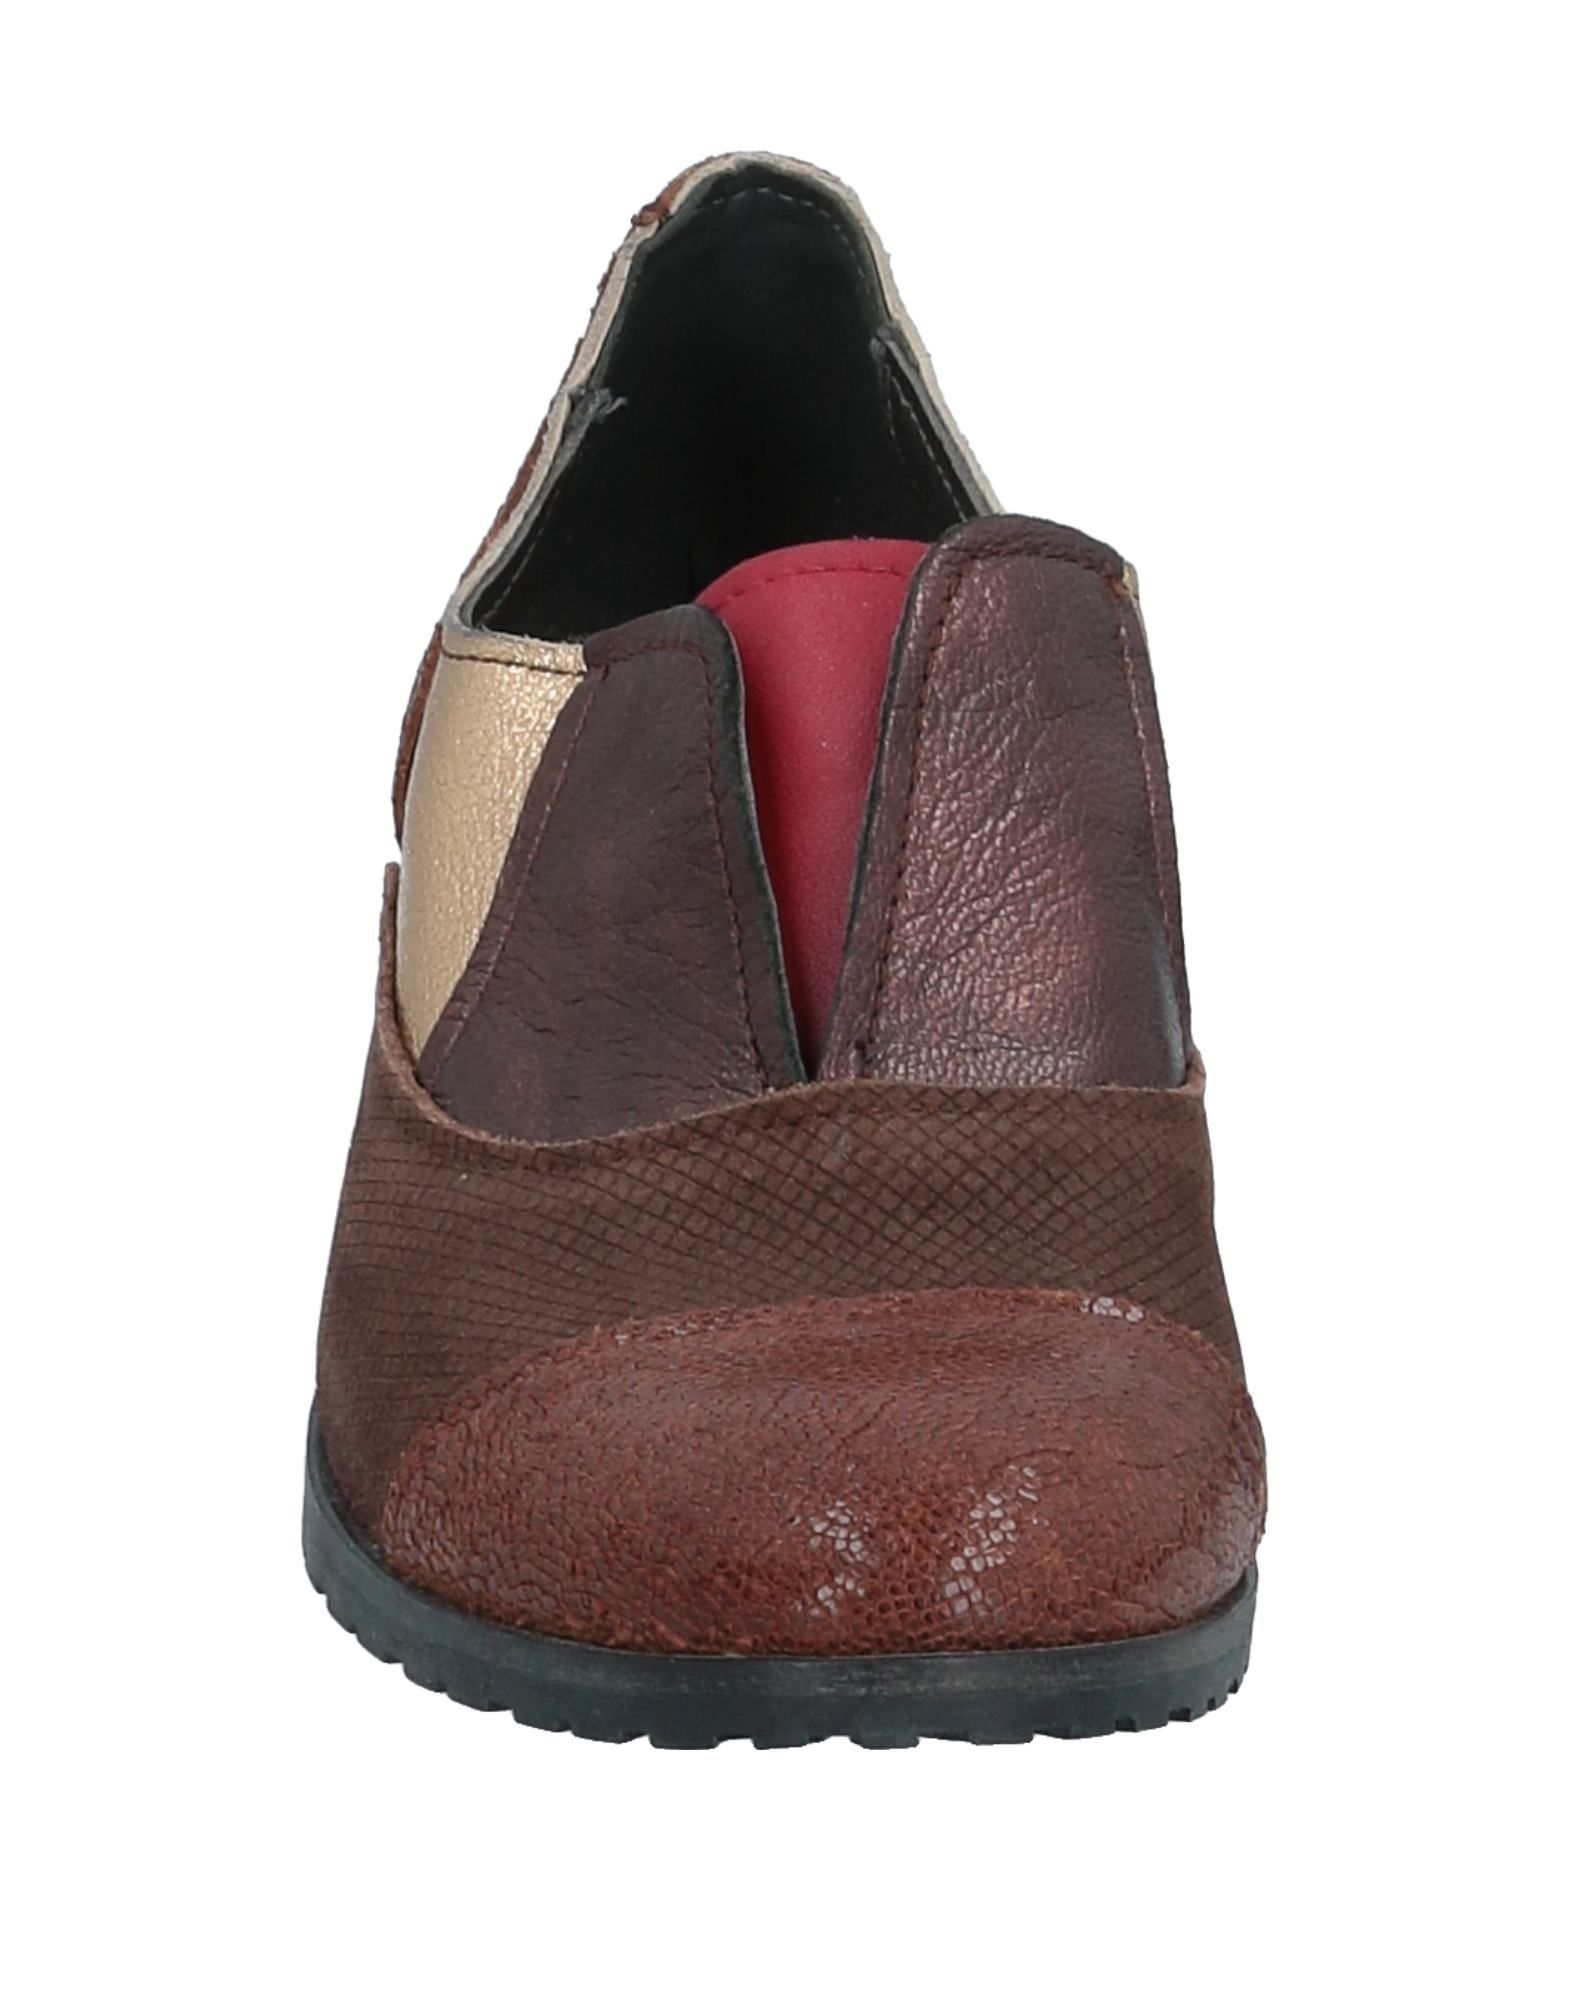 Ebarrito 11516840LQ Mokassins Damen  11516840LQ Ebarrito Gute Qualität beliebte Schuhe a70b3c